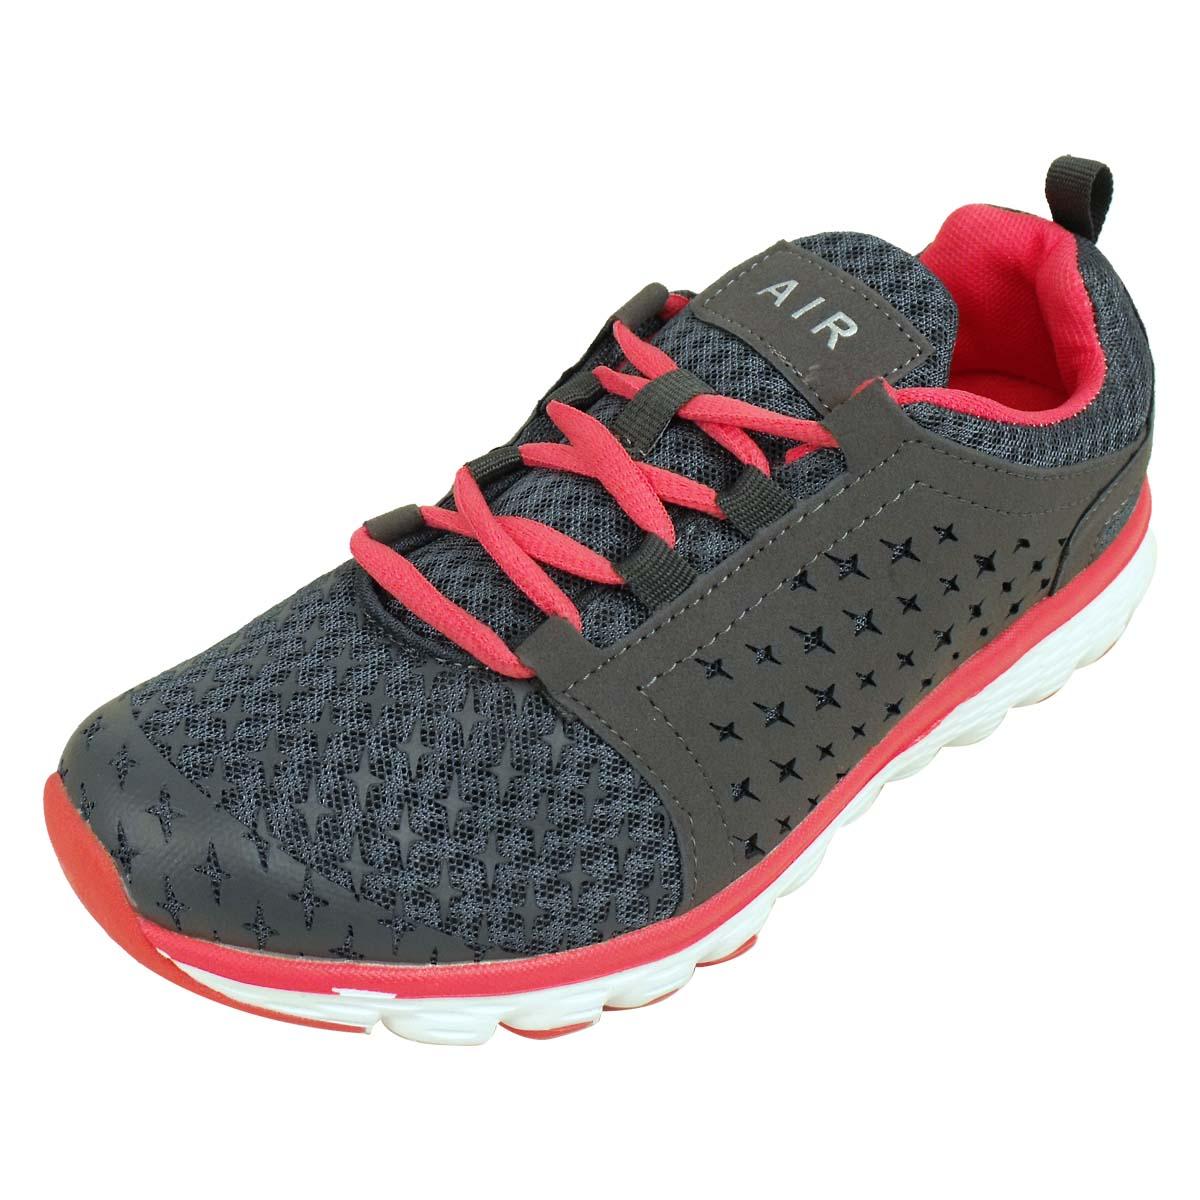 Low Profile Running Shoes Uk